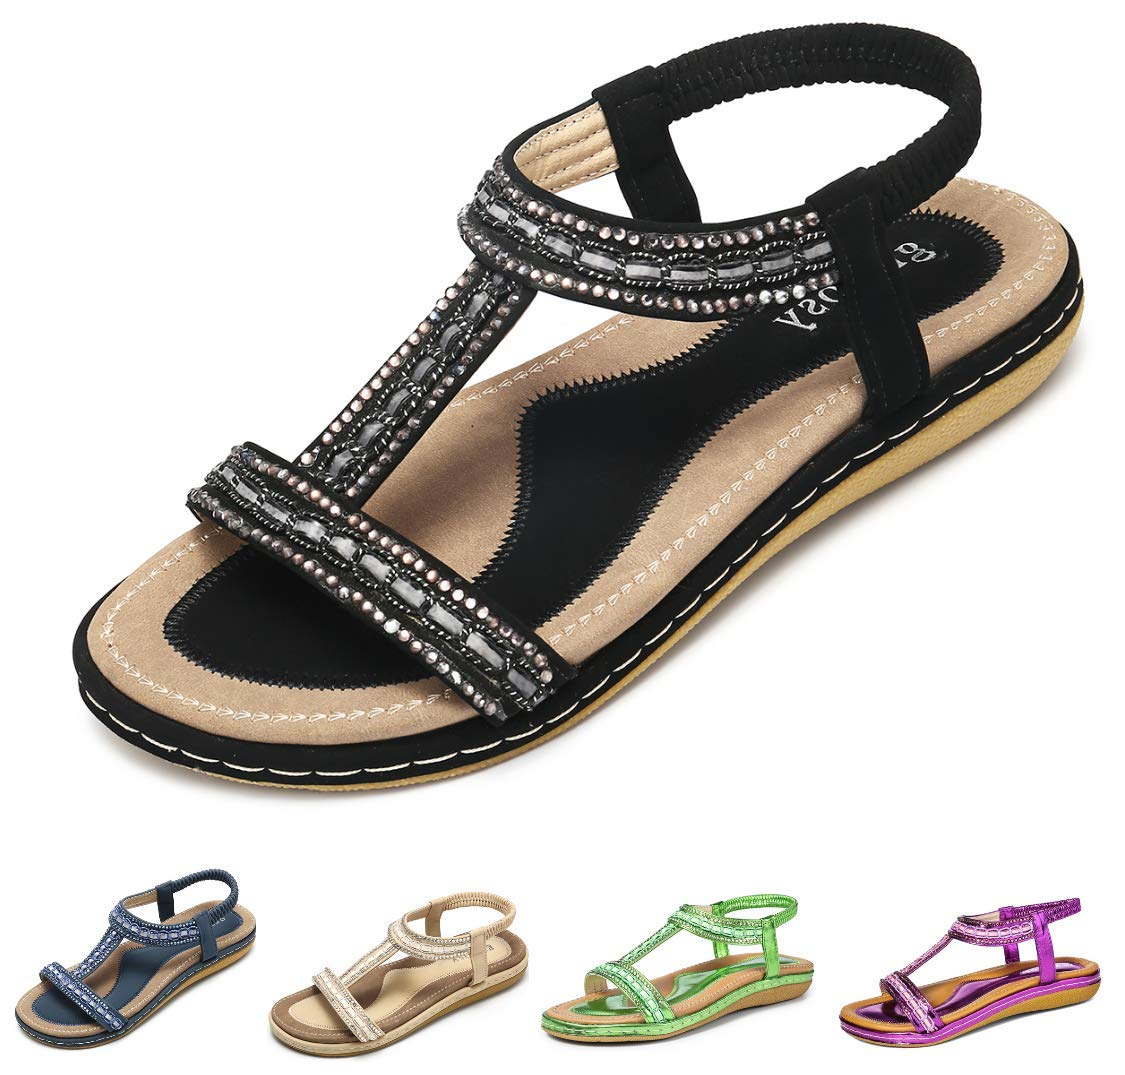 00e4bea10 gracosy Sandalias Planas Verano Mujer Estilo Bohemia Zapatos para Mujer de  Dedo Sandalias Talla Grande 37